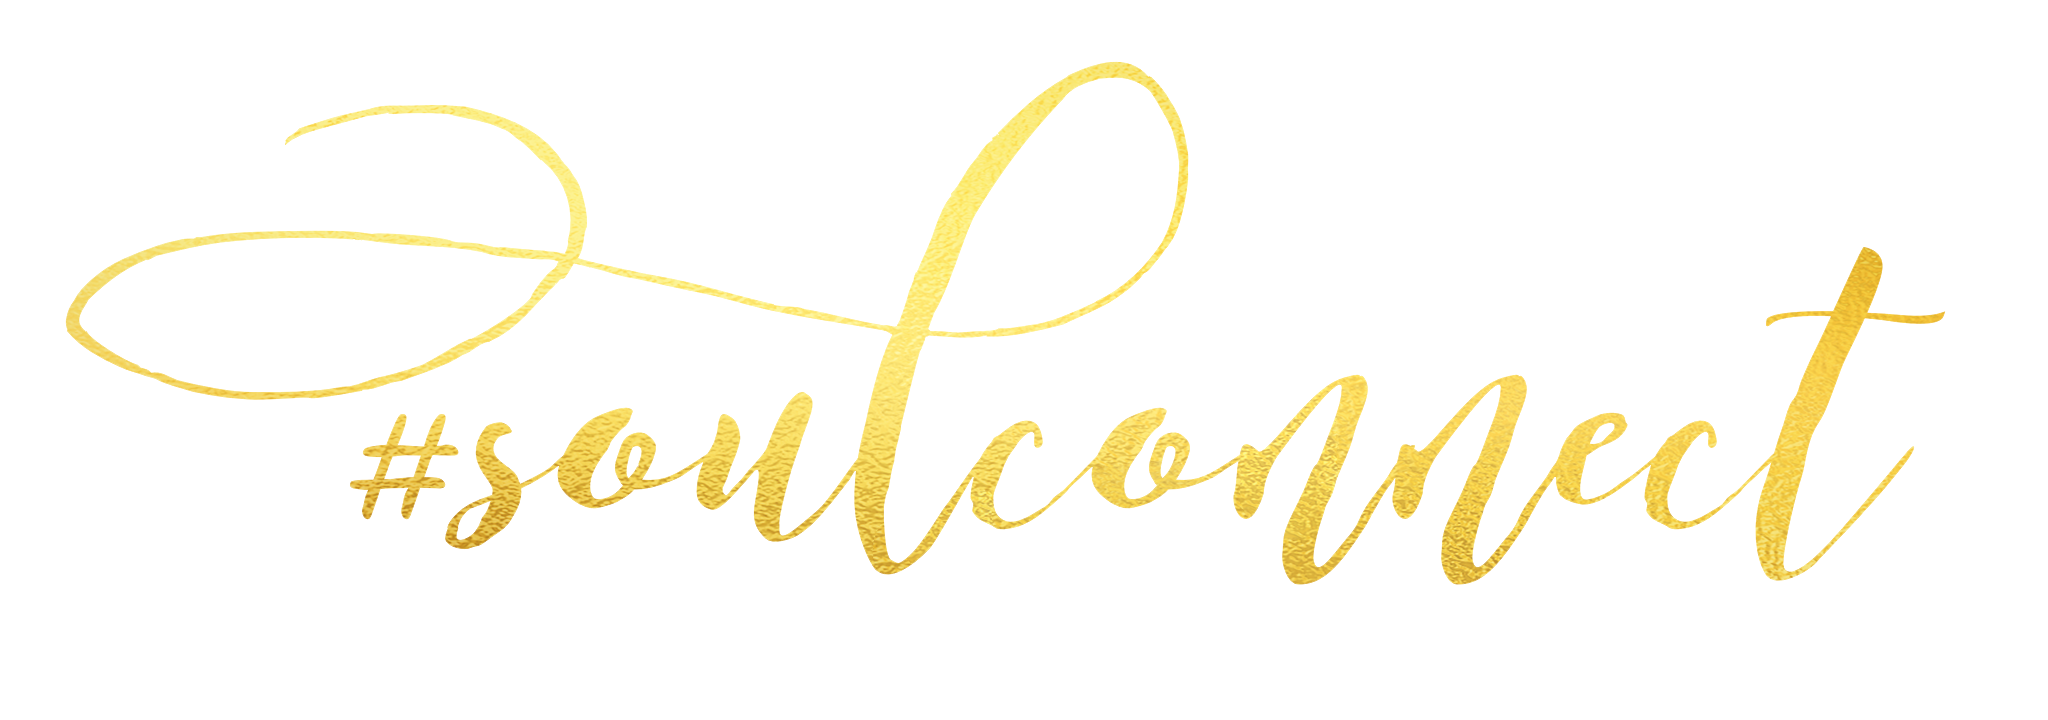 Soulconnect_Final_v1.png